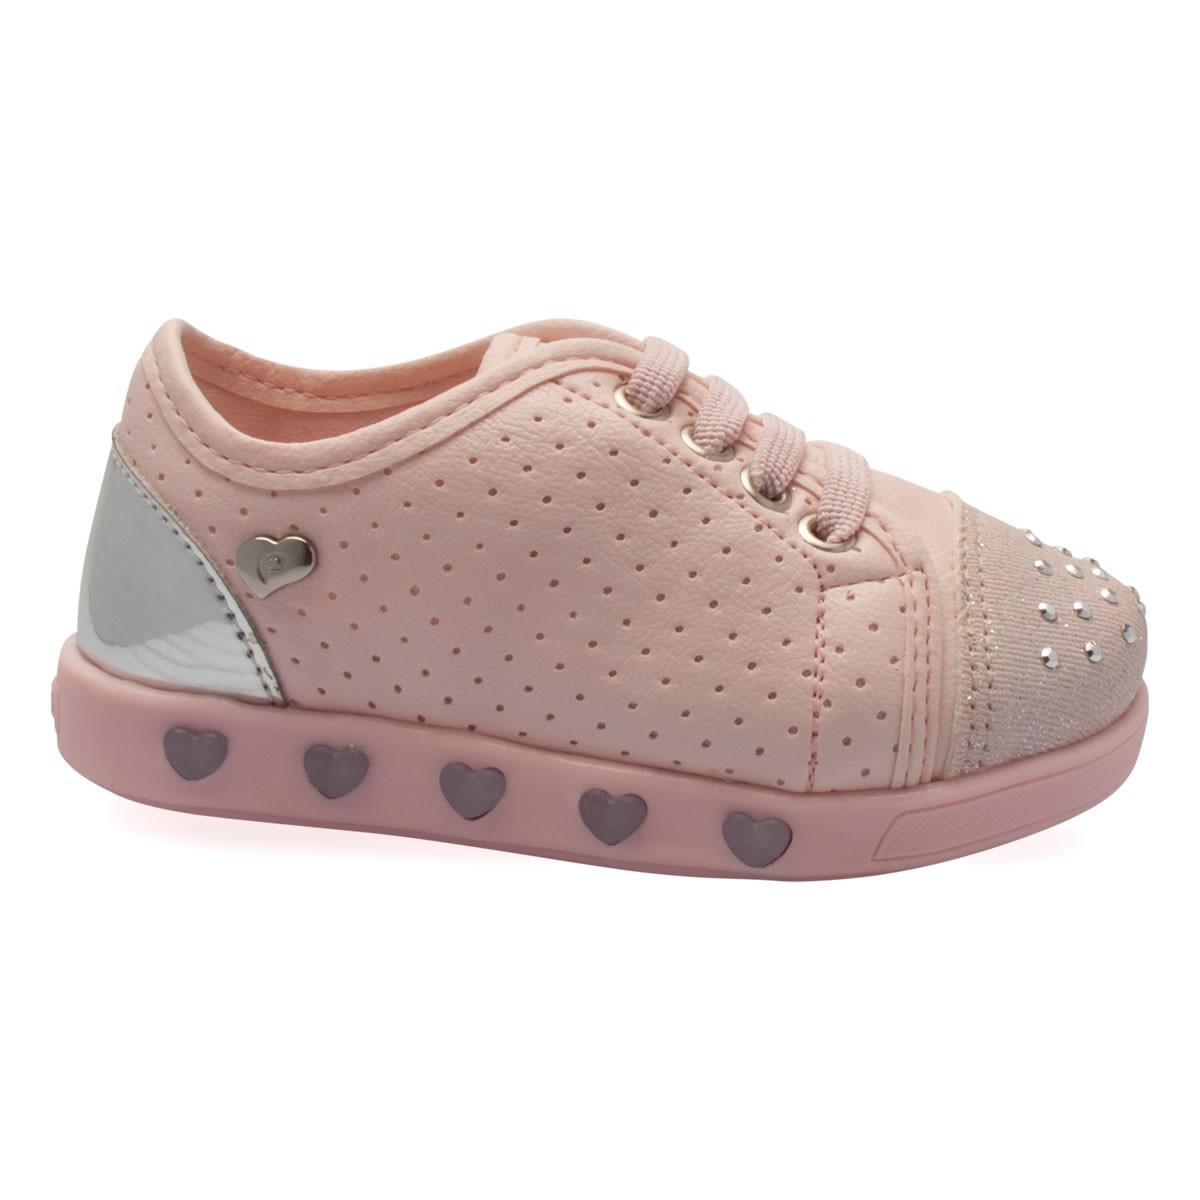 8d6684ca5 Bizz Store - Tênis Infantil Menina Pampili Sneaker Com Luzinha